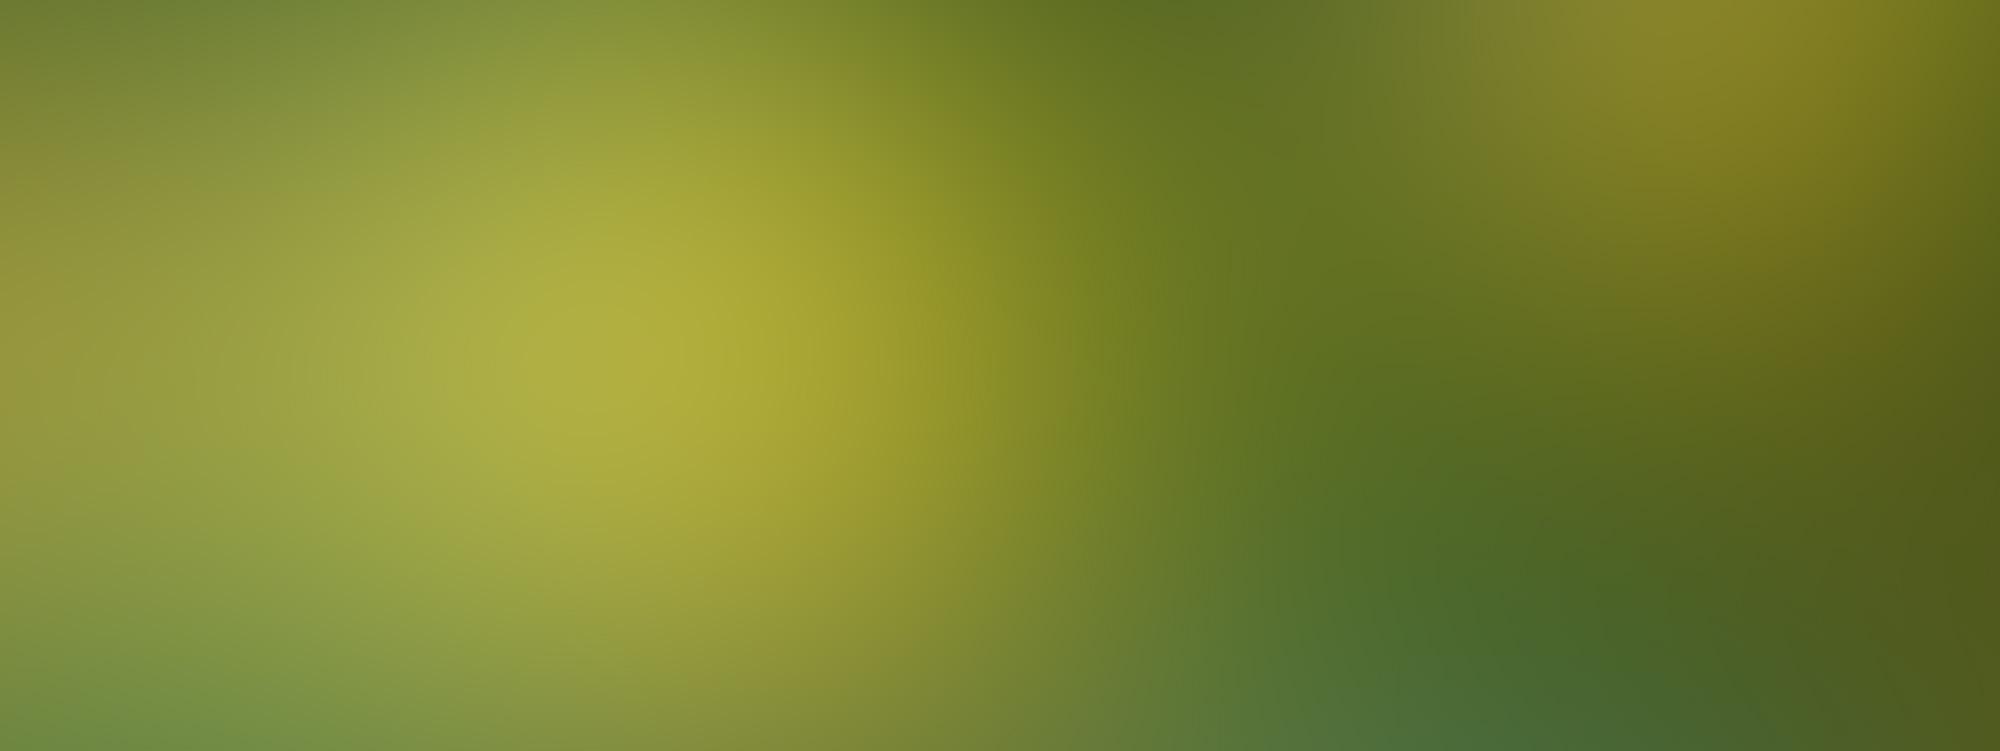 gradiant image